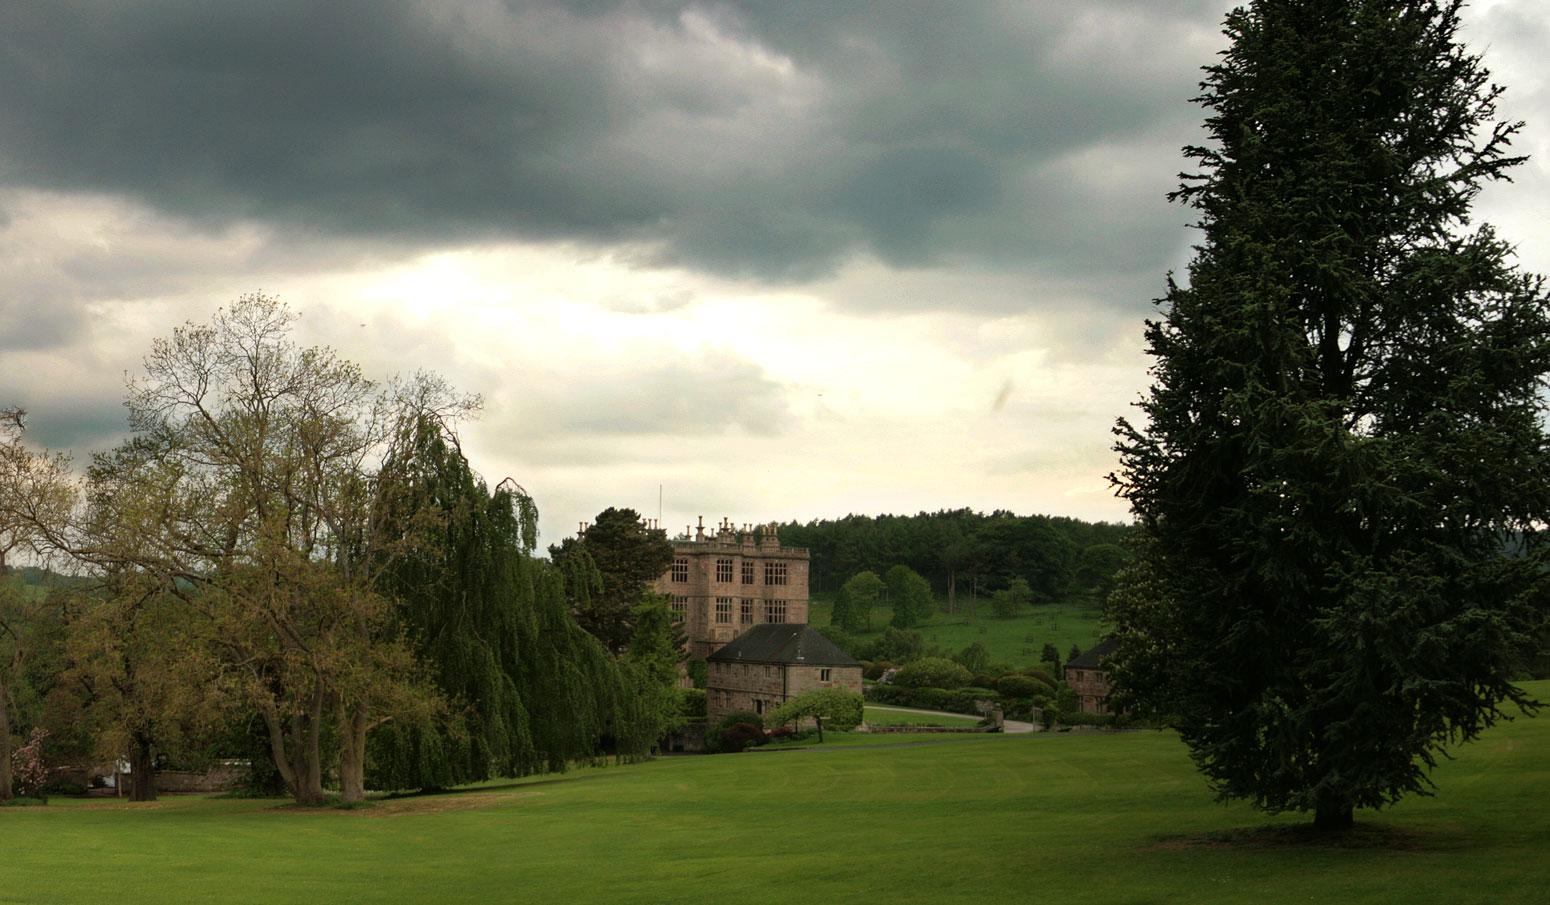 Wotton Lodge